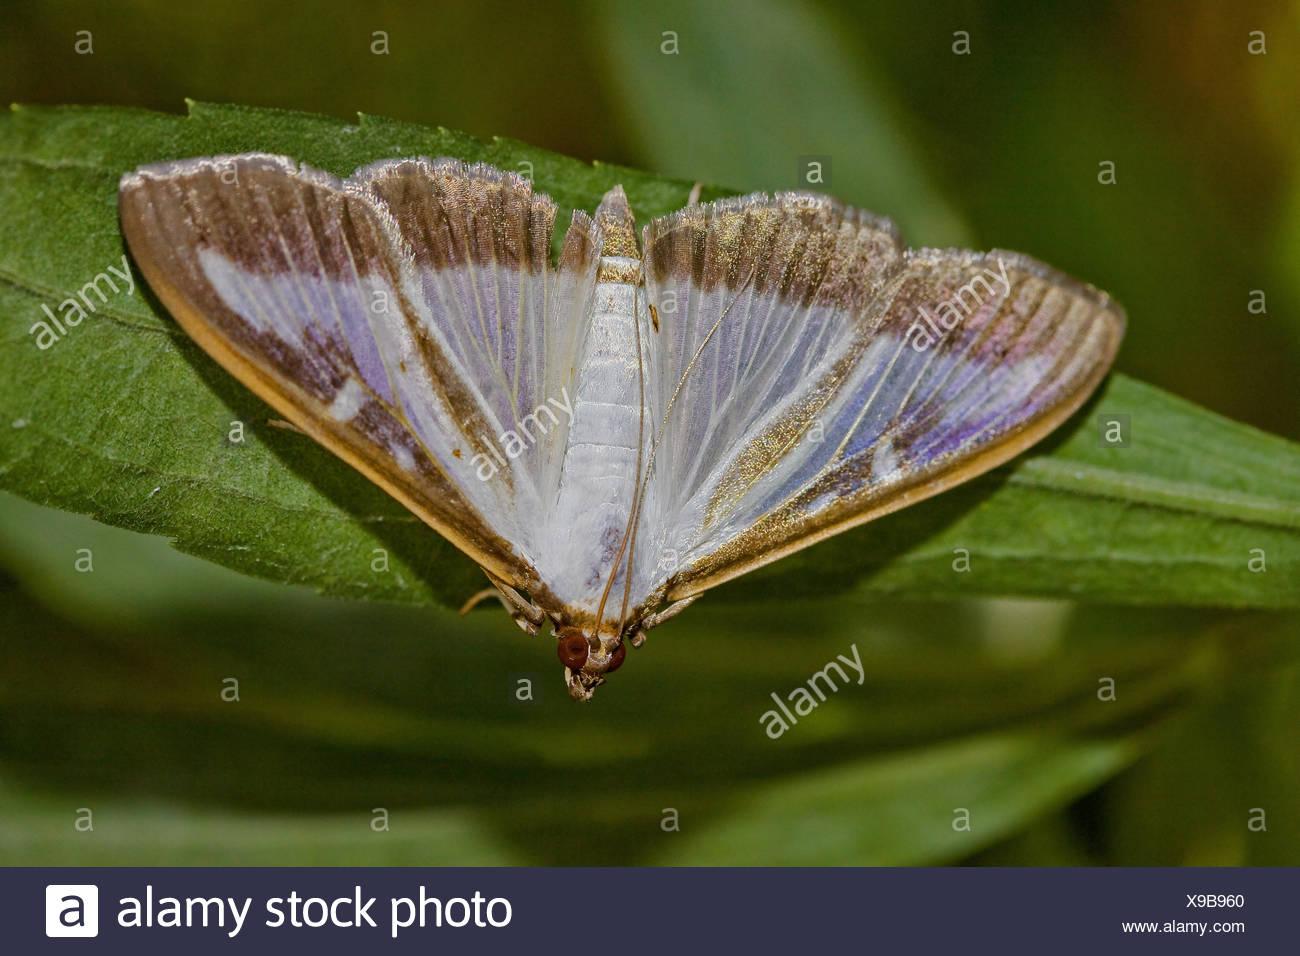 Box tree Moth Cydalima perspectalis - Stock Image